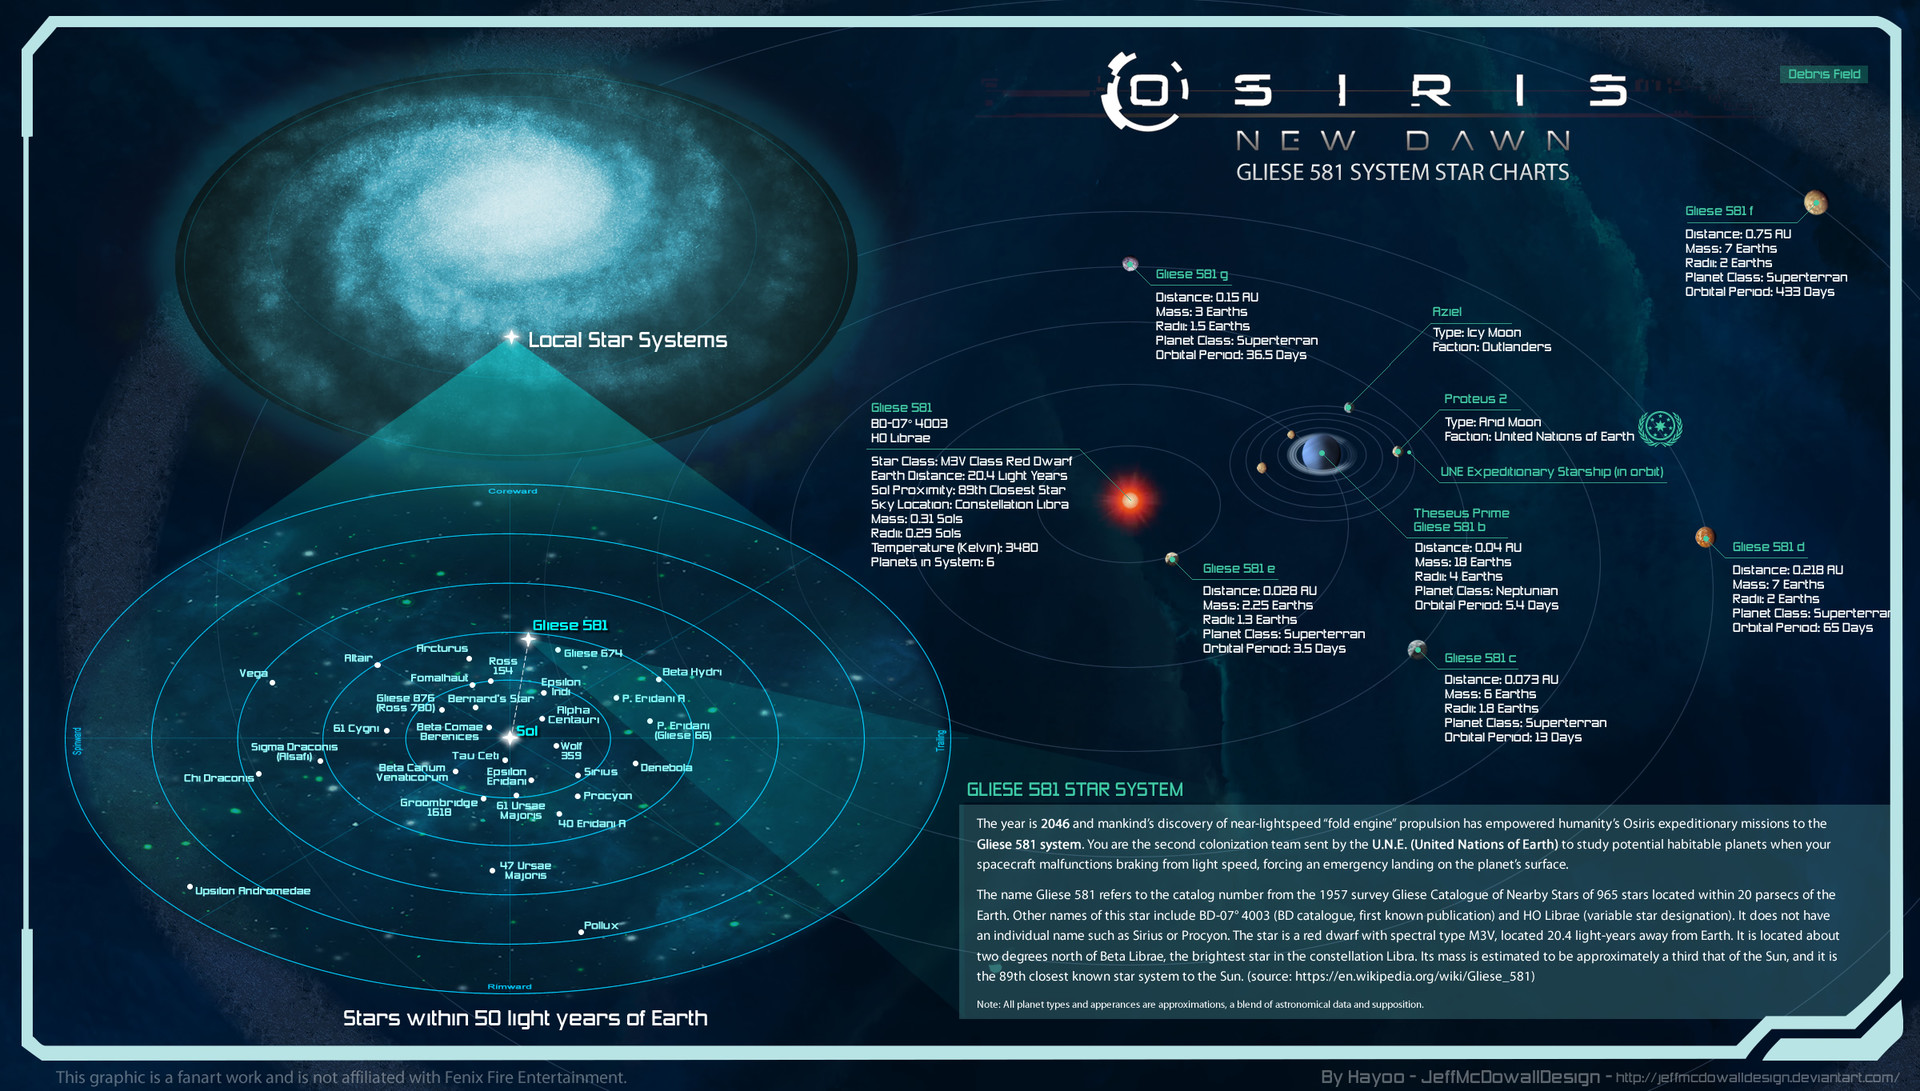 Jeff mcdowall osiris new dawn gliese star system final